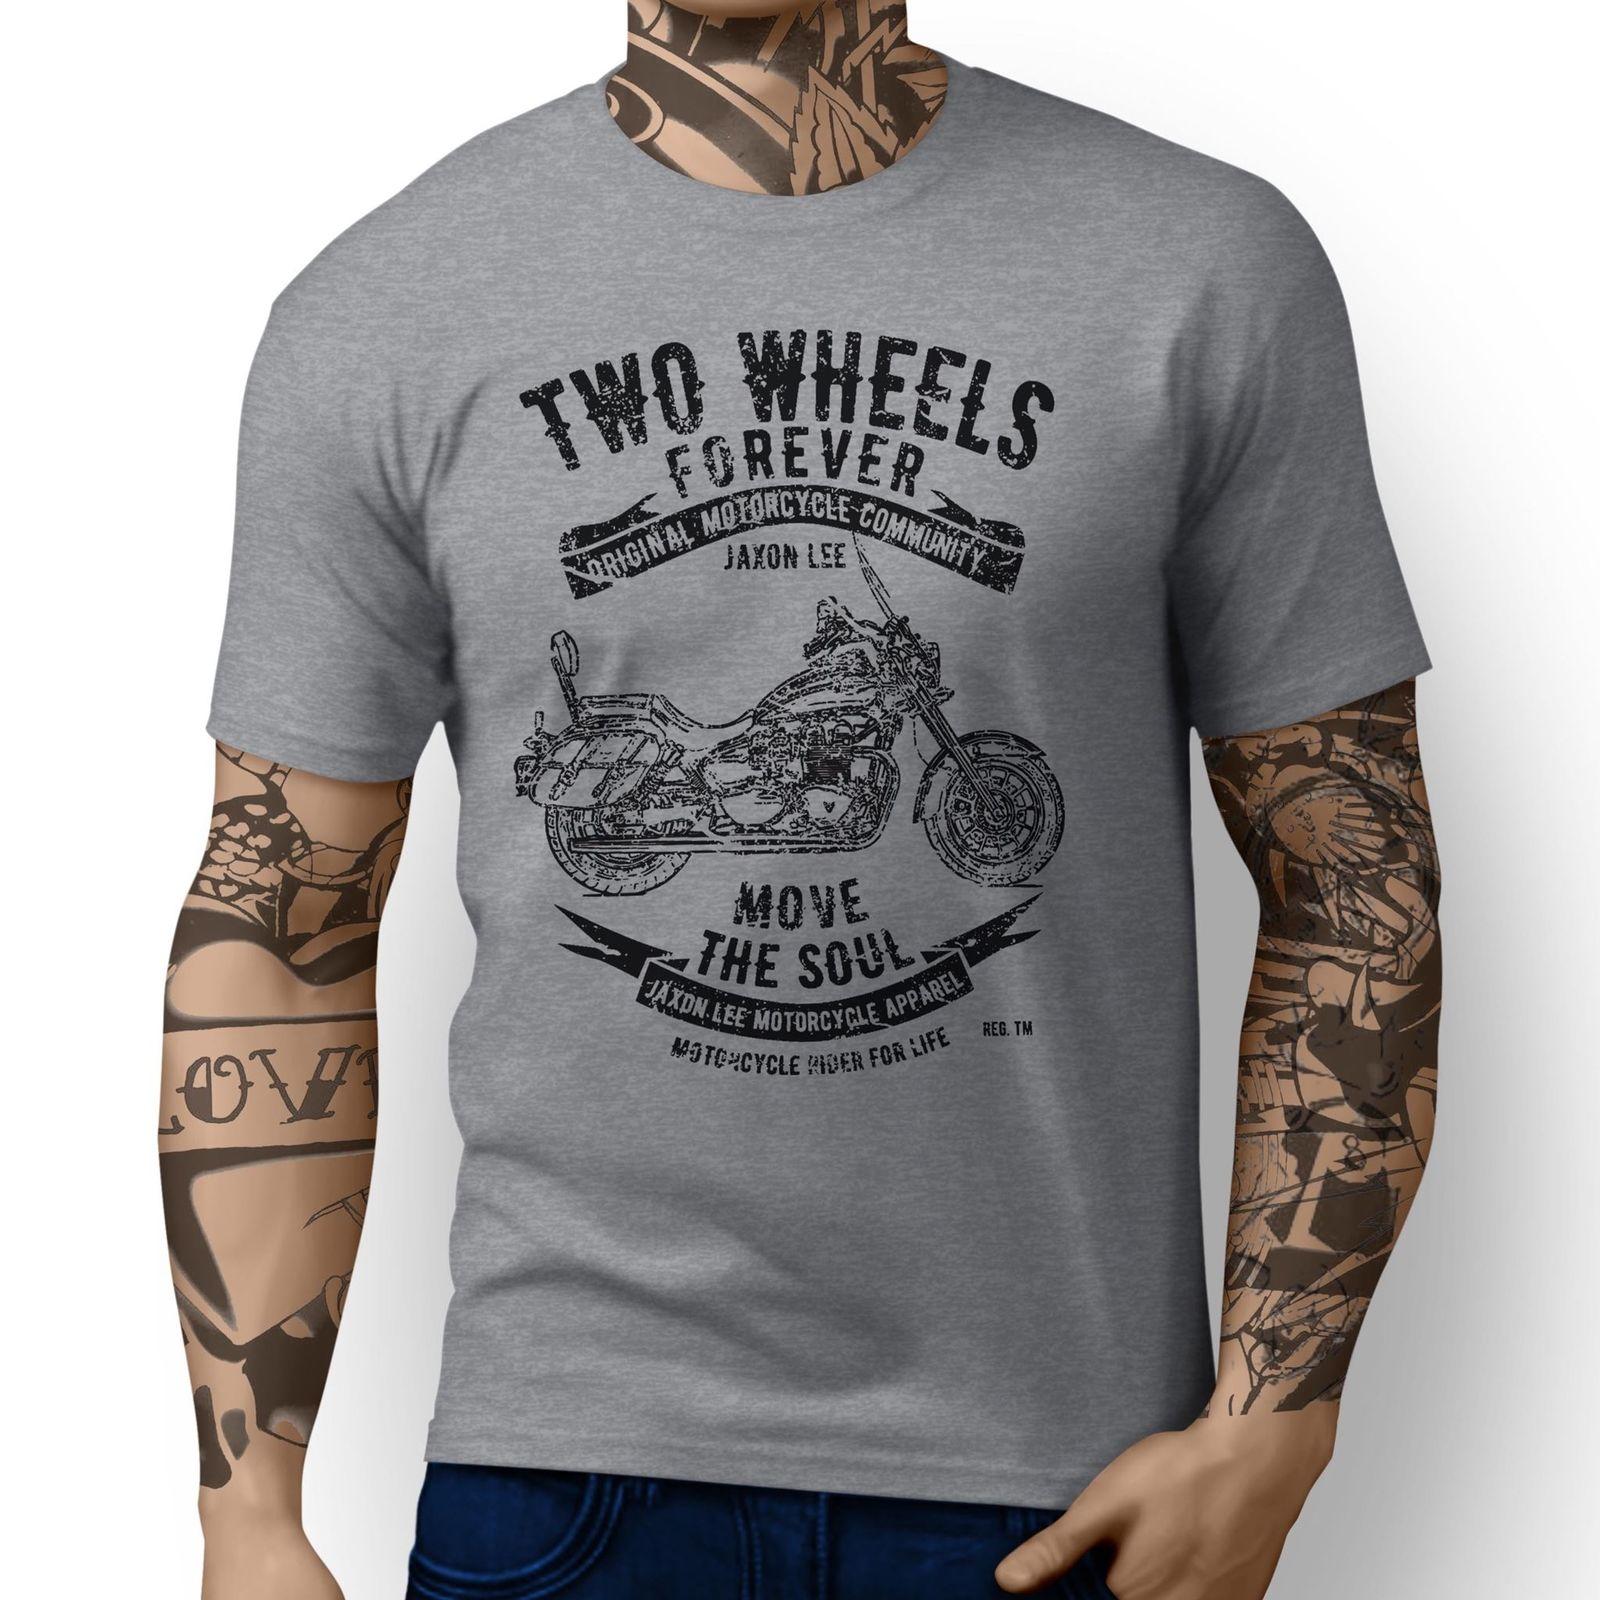 2019 New Fashion American Motorbike America LT Inspired Motorcycle Art T-shirts